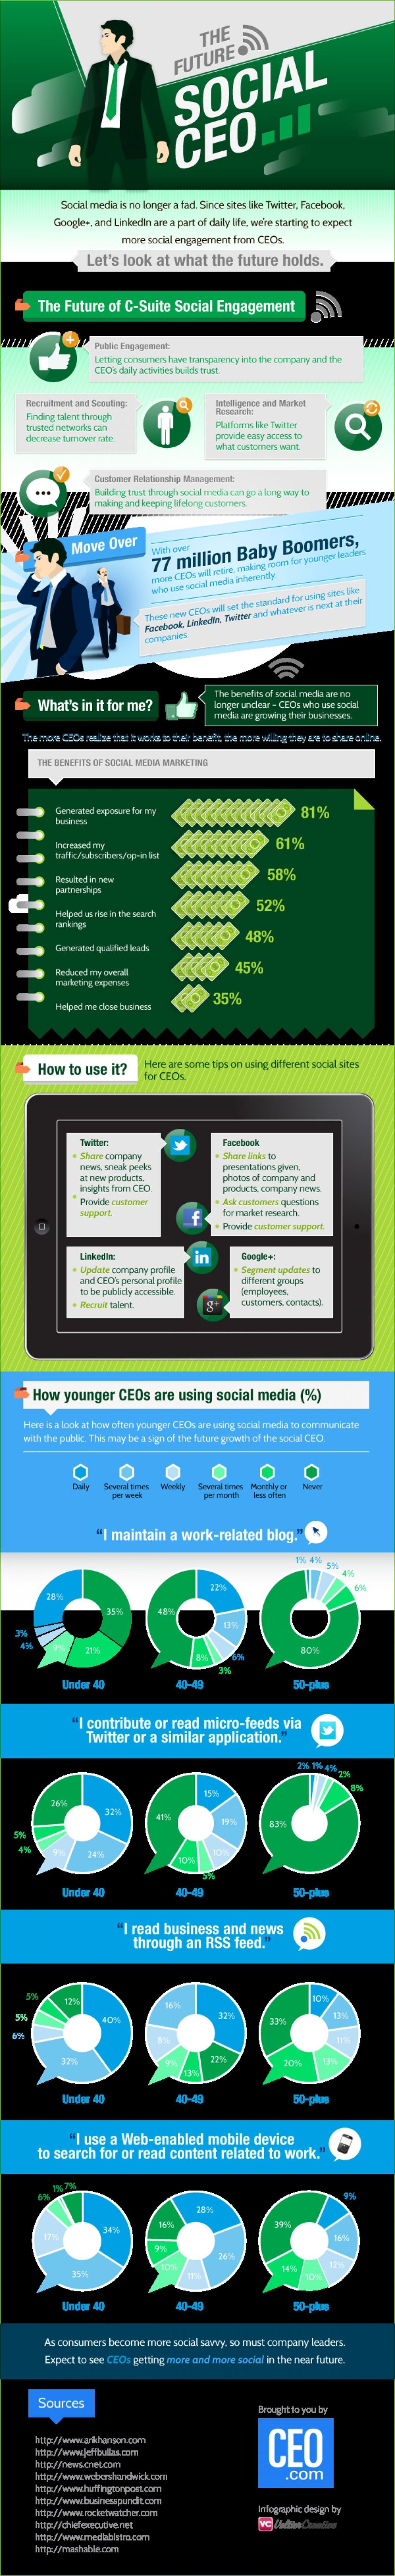 1. The Future Social CEO